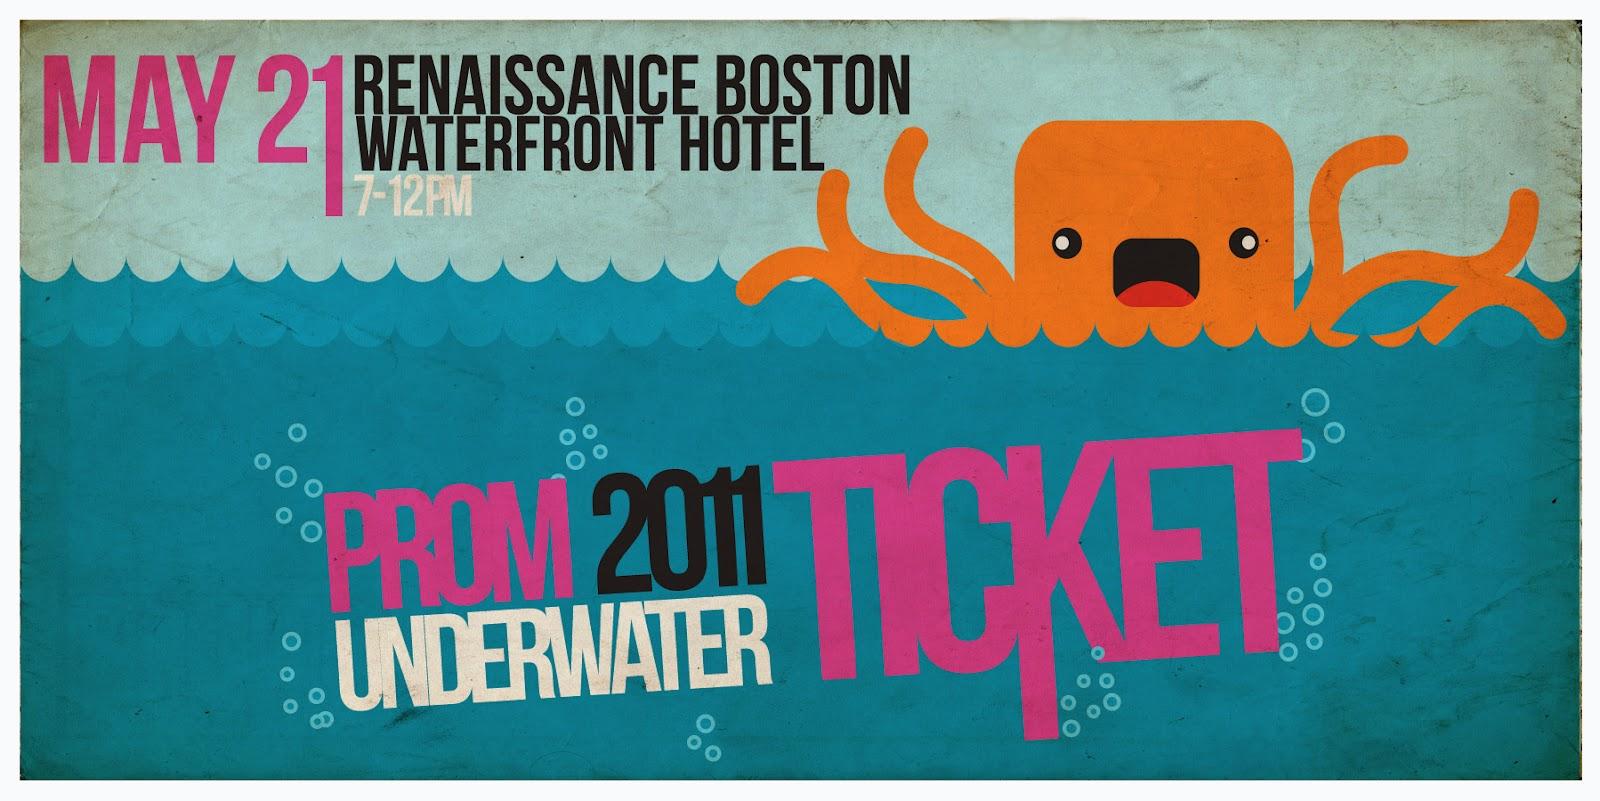 prom ticket 2010 kevin bae s portfolio